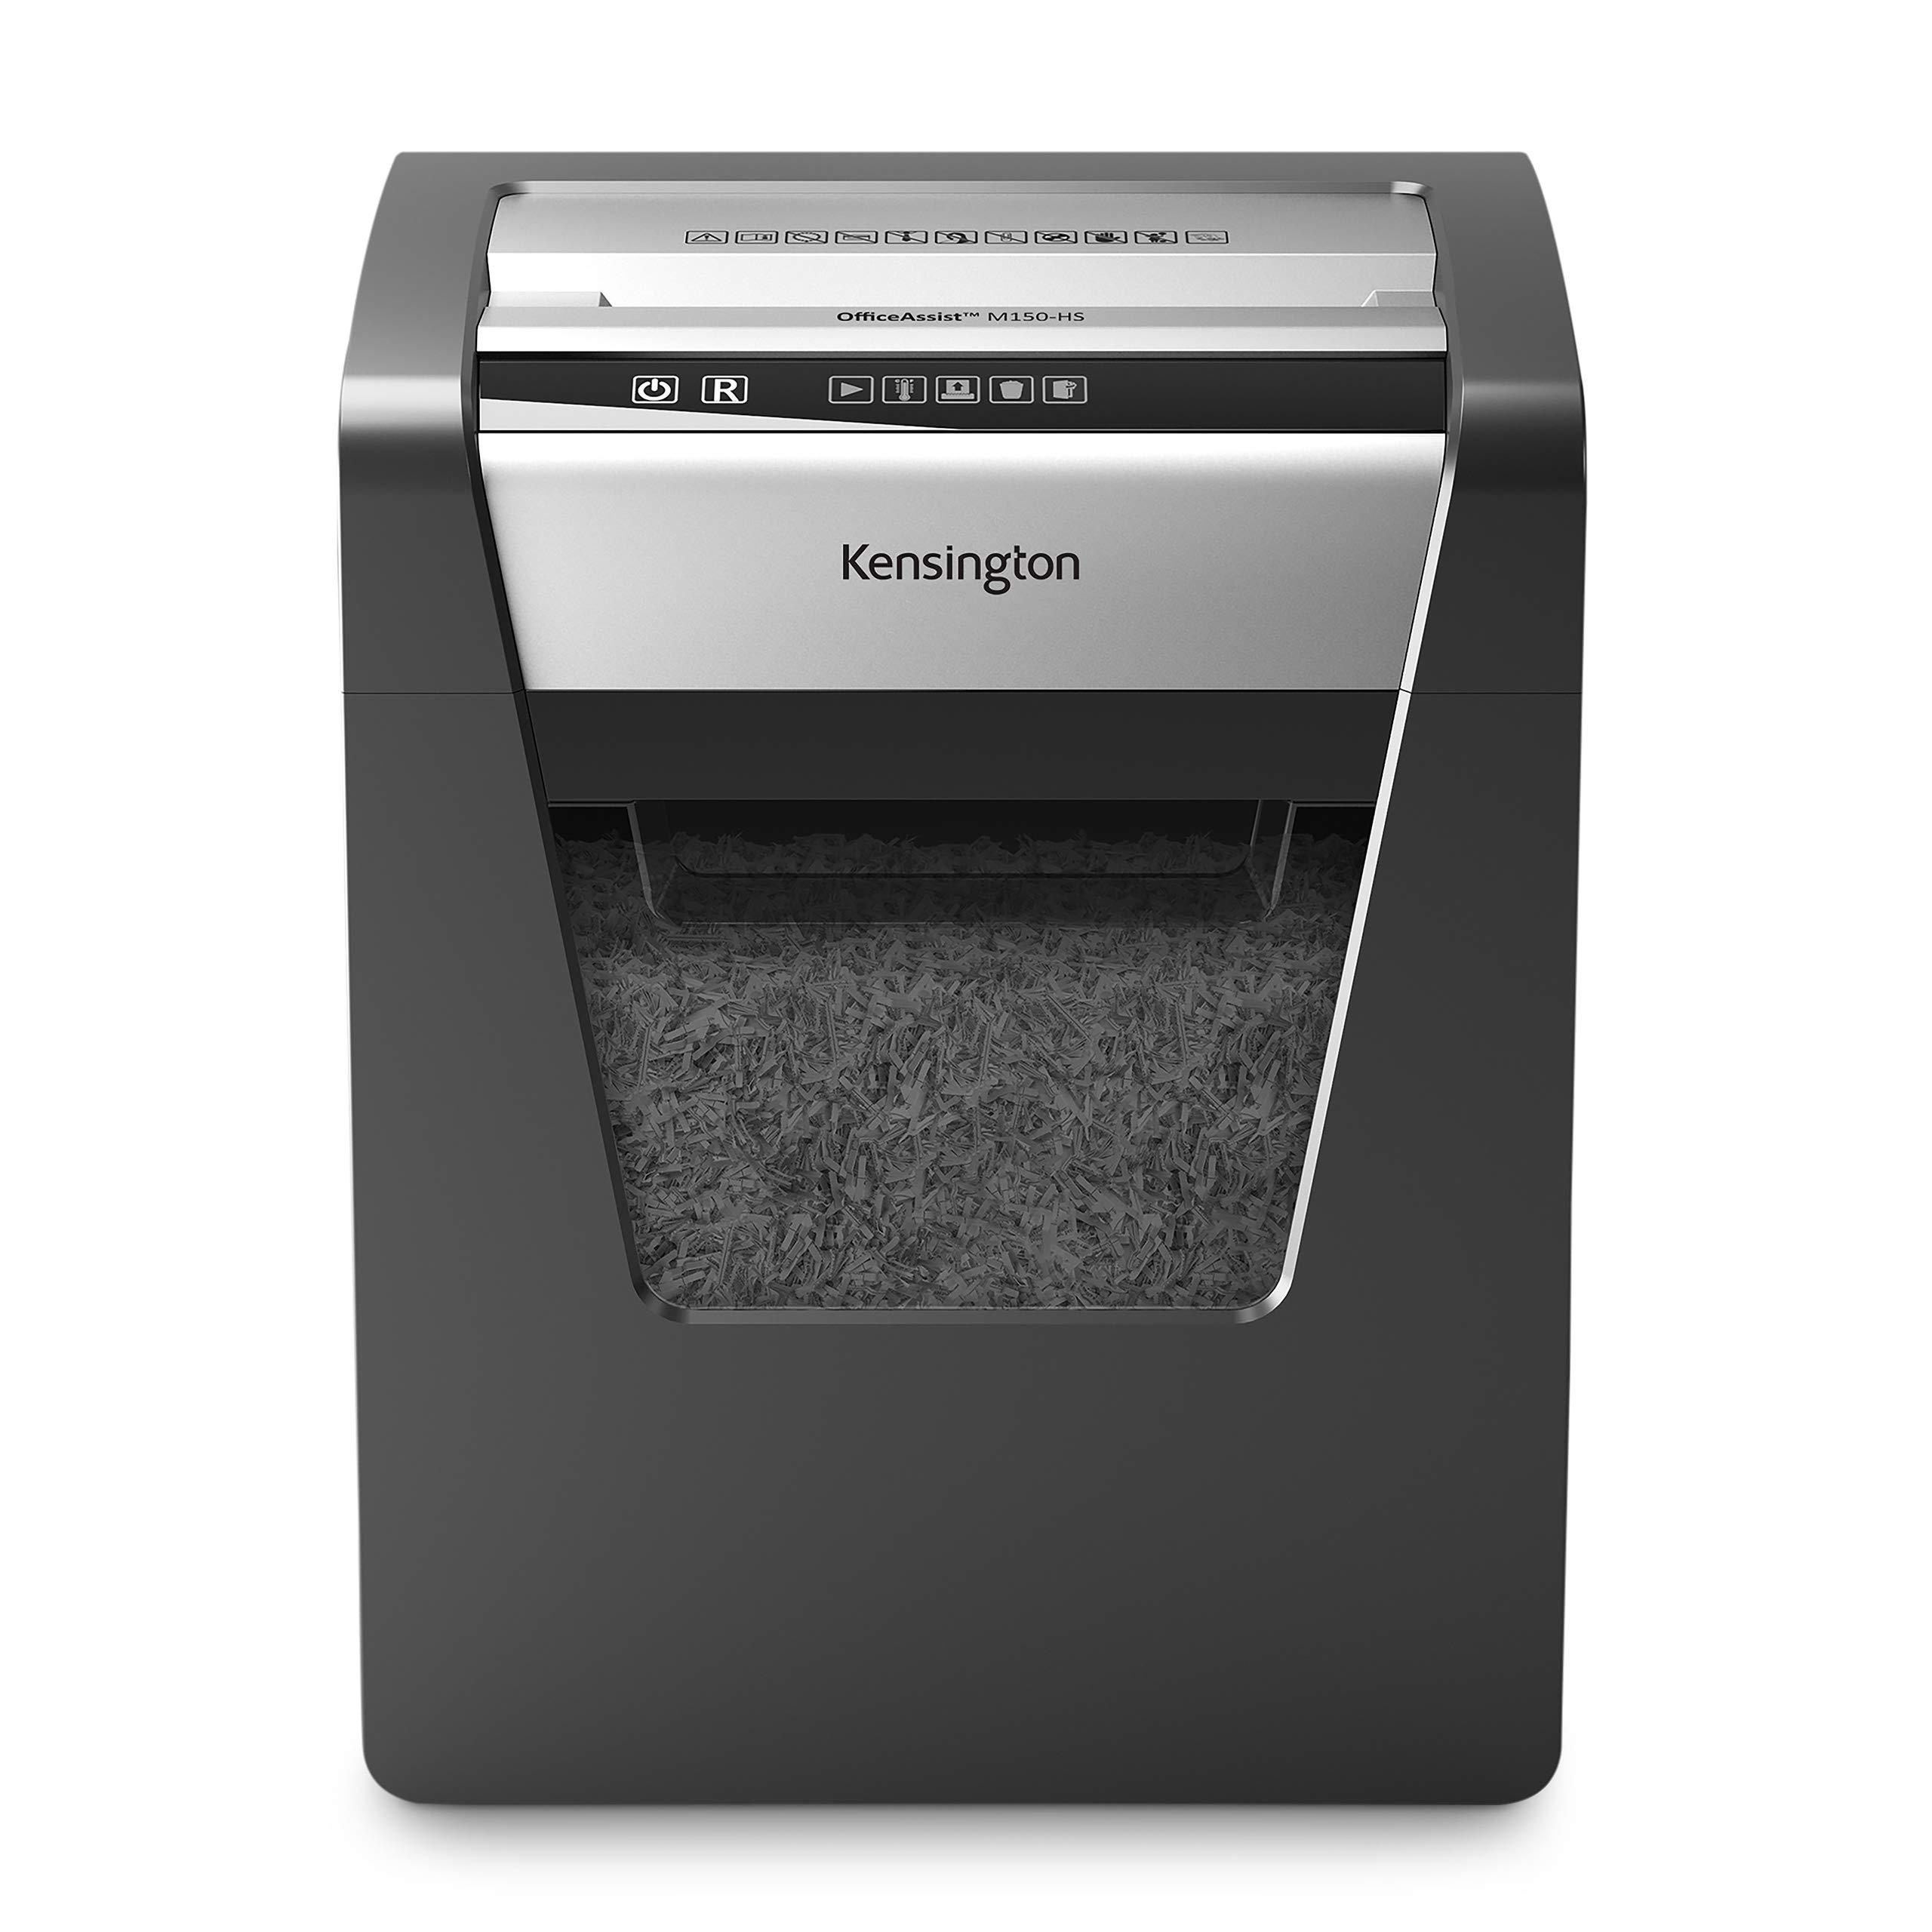 Kensington Micro Cut Shredder - Office Assist M150-Hs Anti-Jam (K52077AM) by Kensington